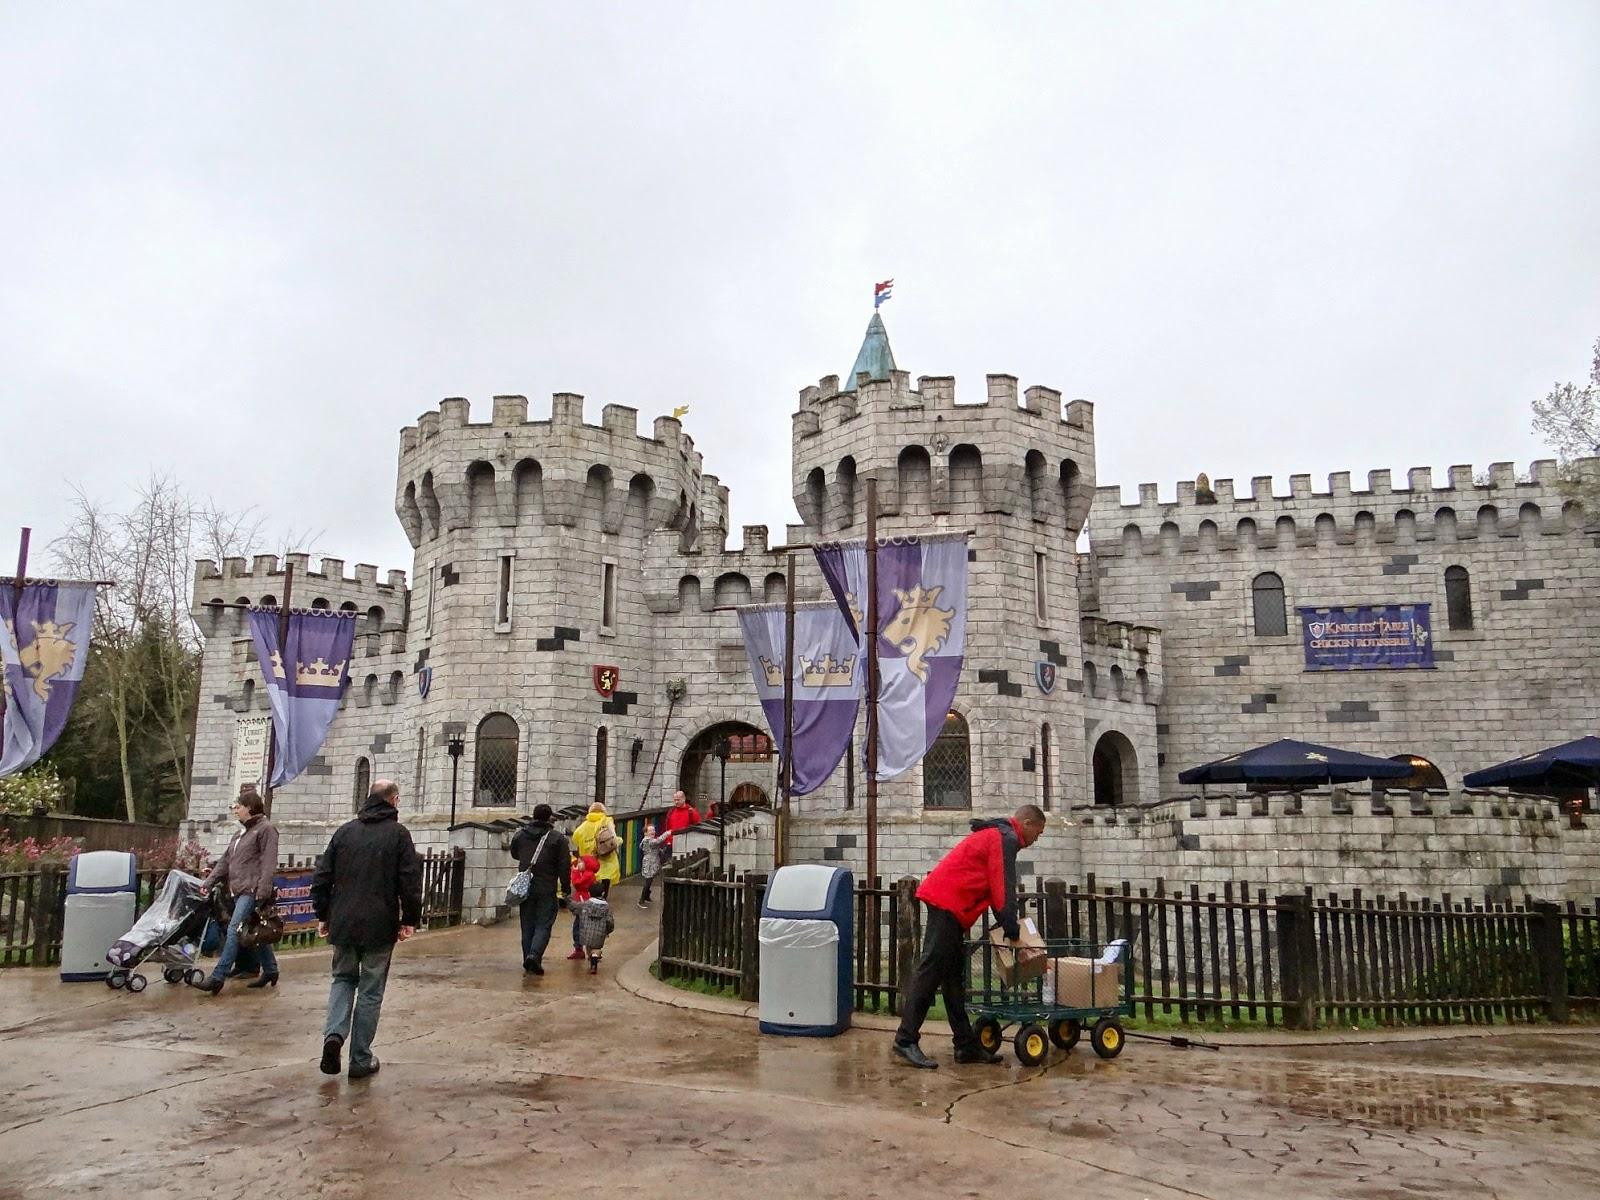 Legoland Windsor 2014, Legoland Windsor Easter, Legoland Windsor Knights Kingdom